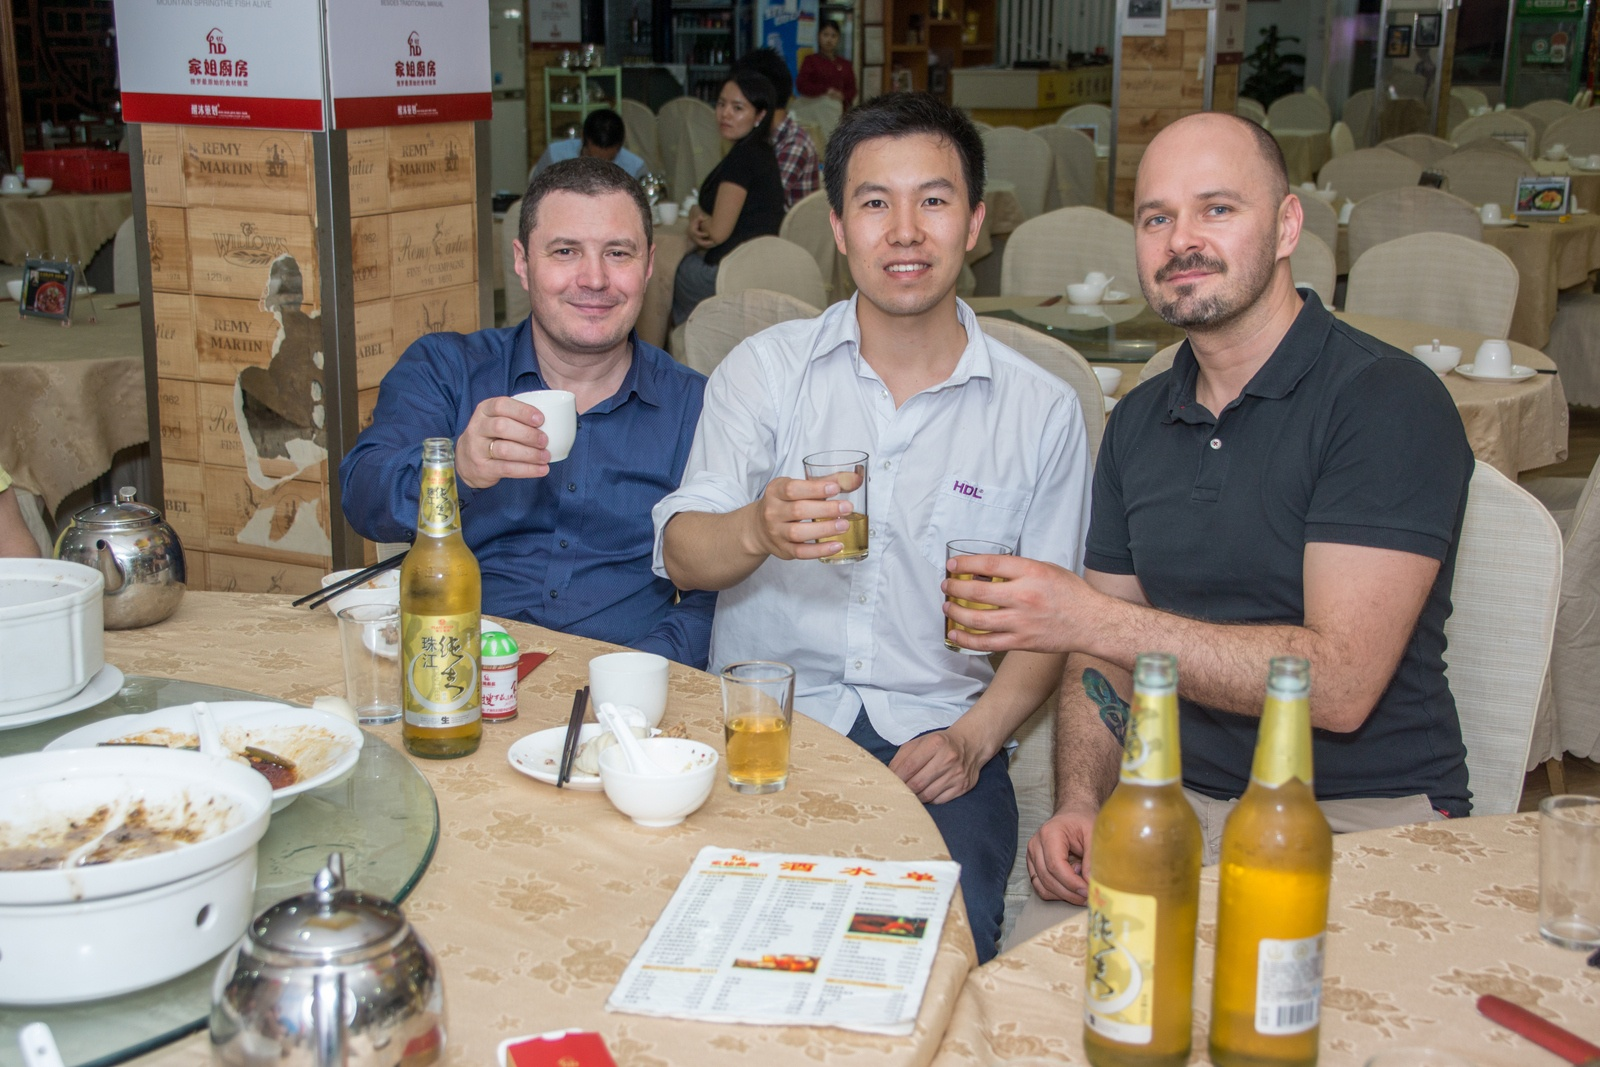 Китай. Завод устройств для «Умного дома». Учимся и учим - 8